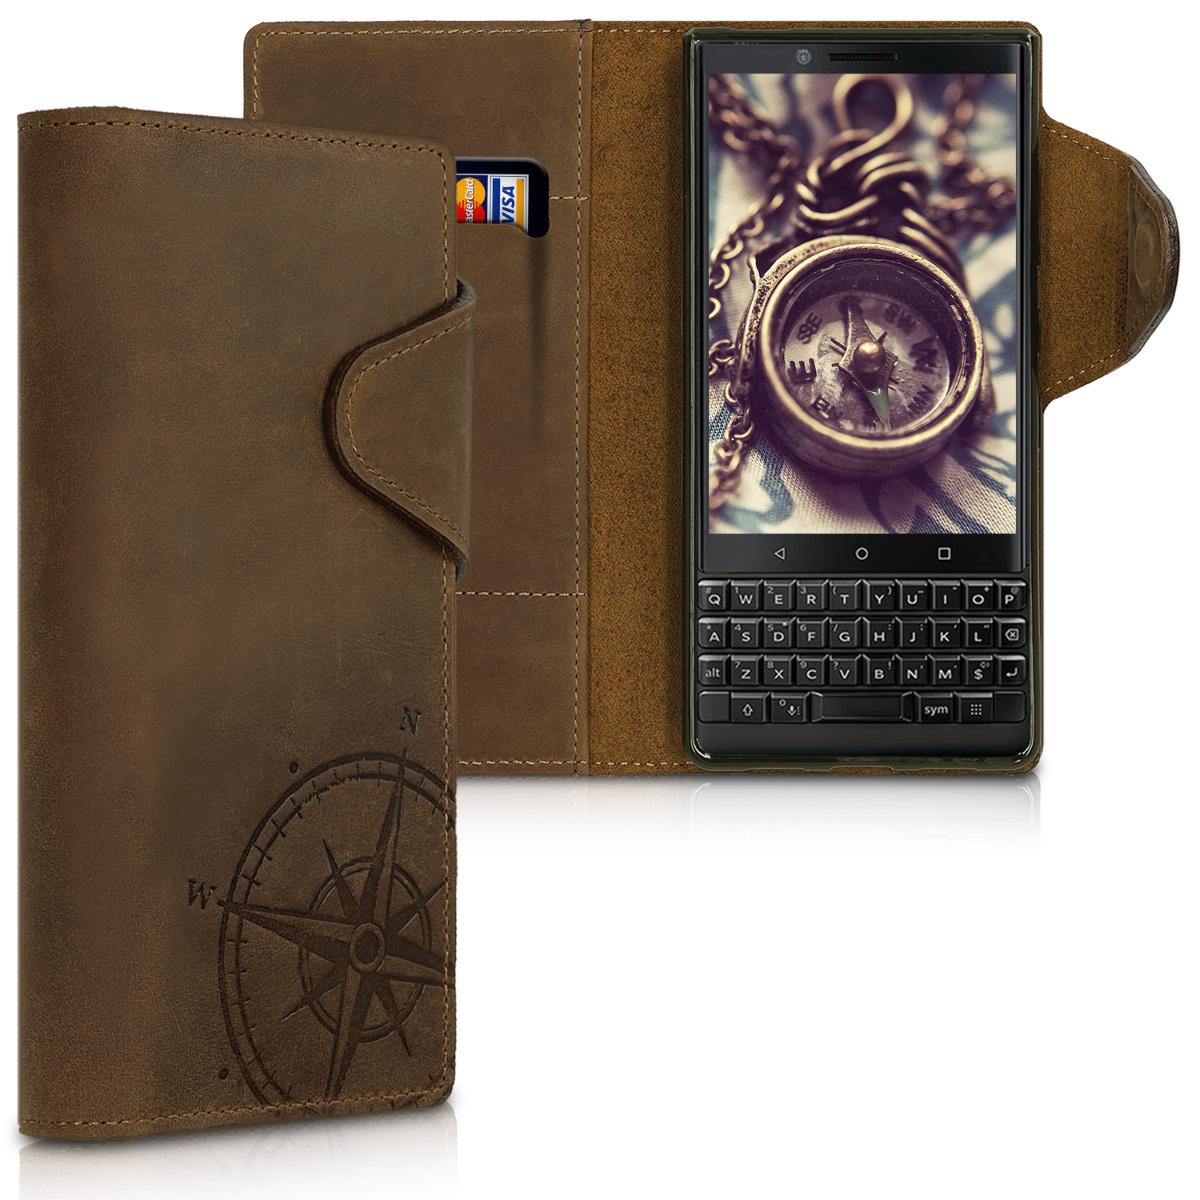 Kalibri Δερμάτινη Suede Θήκη - Πορτοφόλι Blackberry KEY2 - Brown Compass (46466.01)